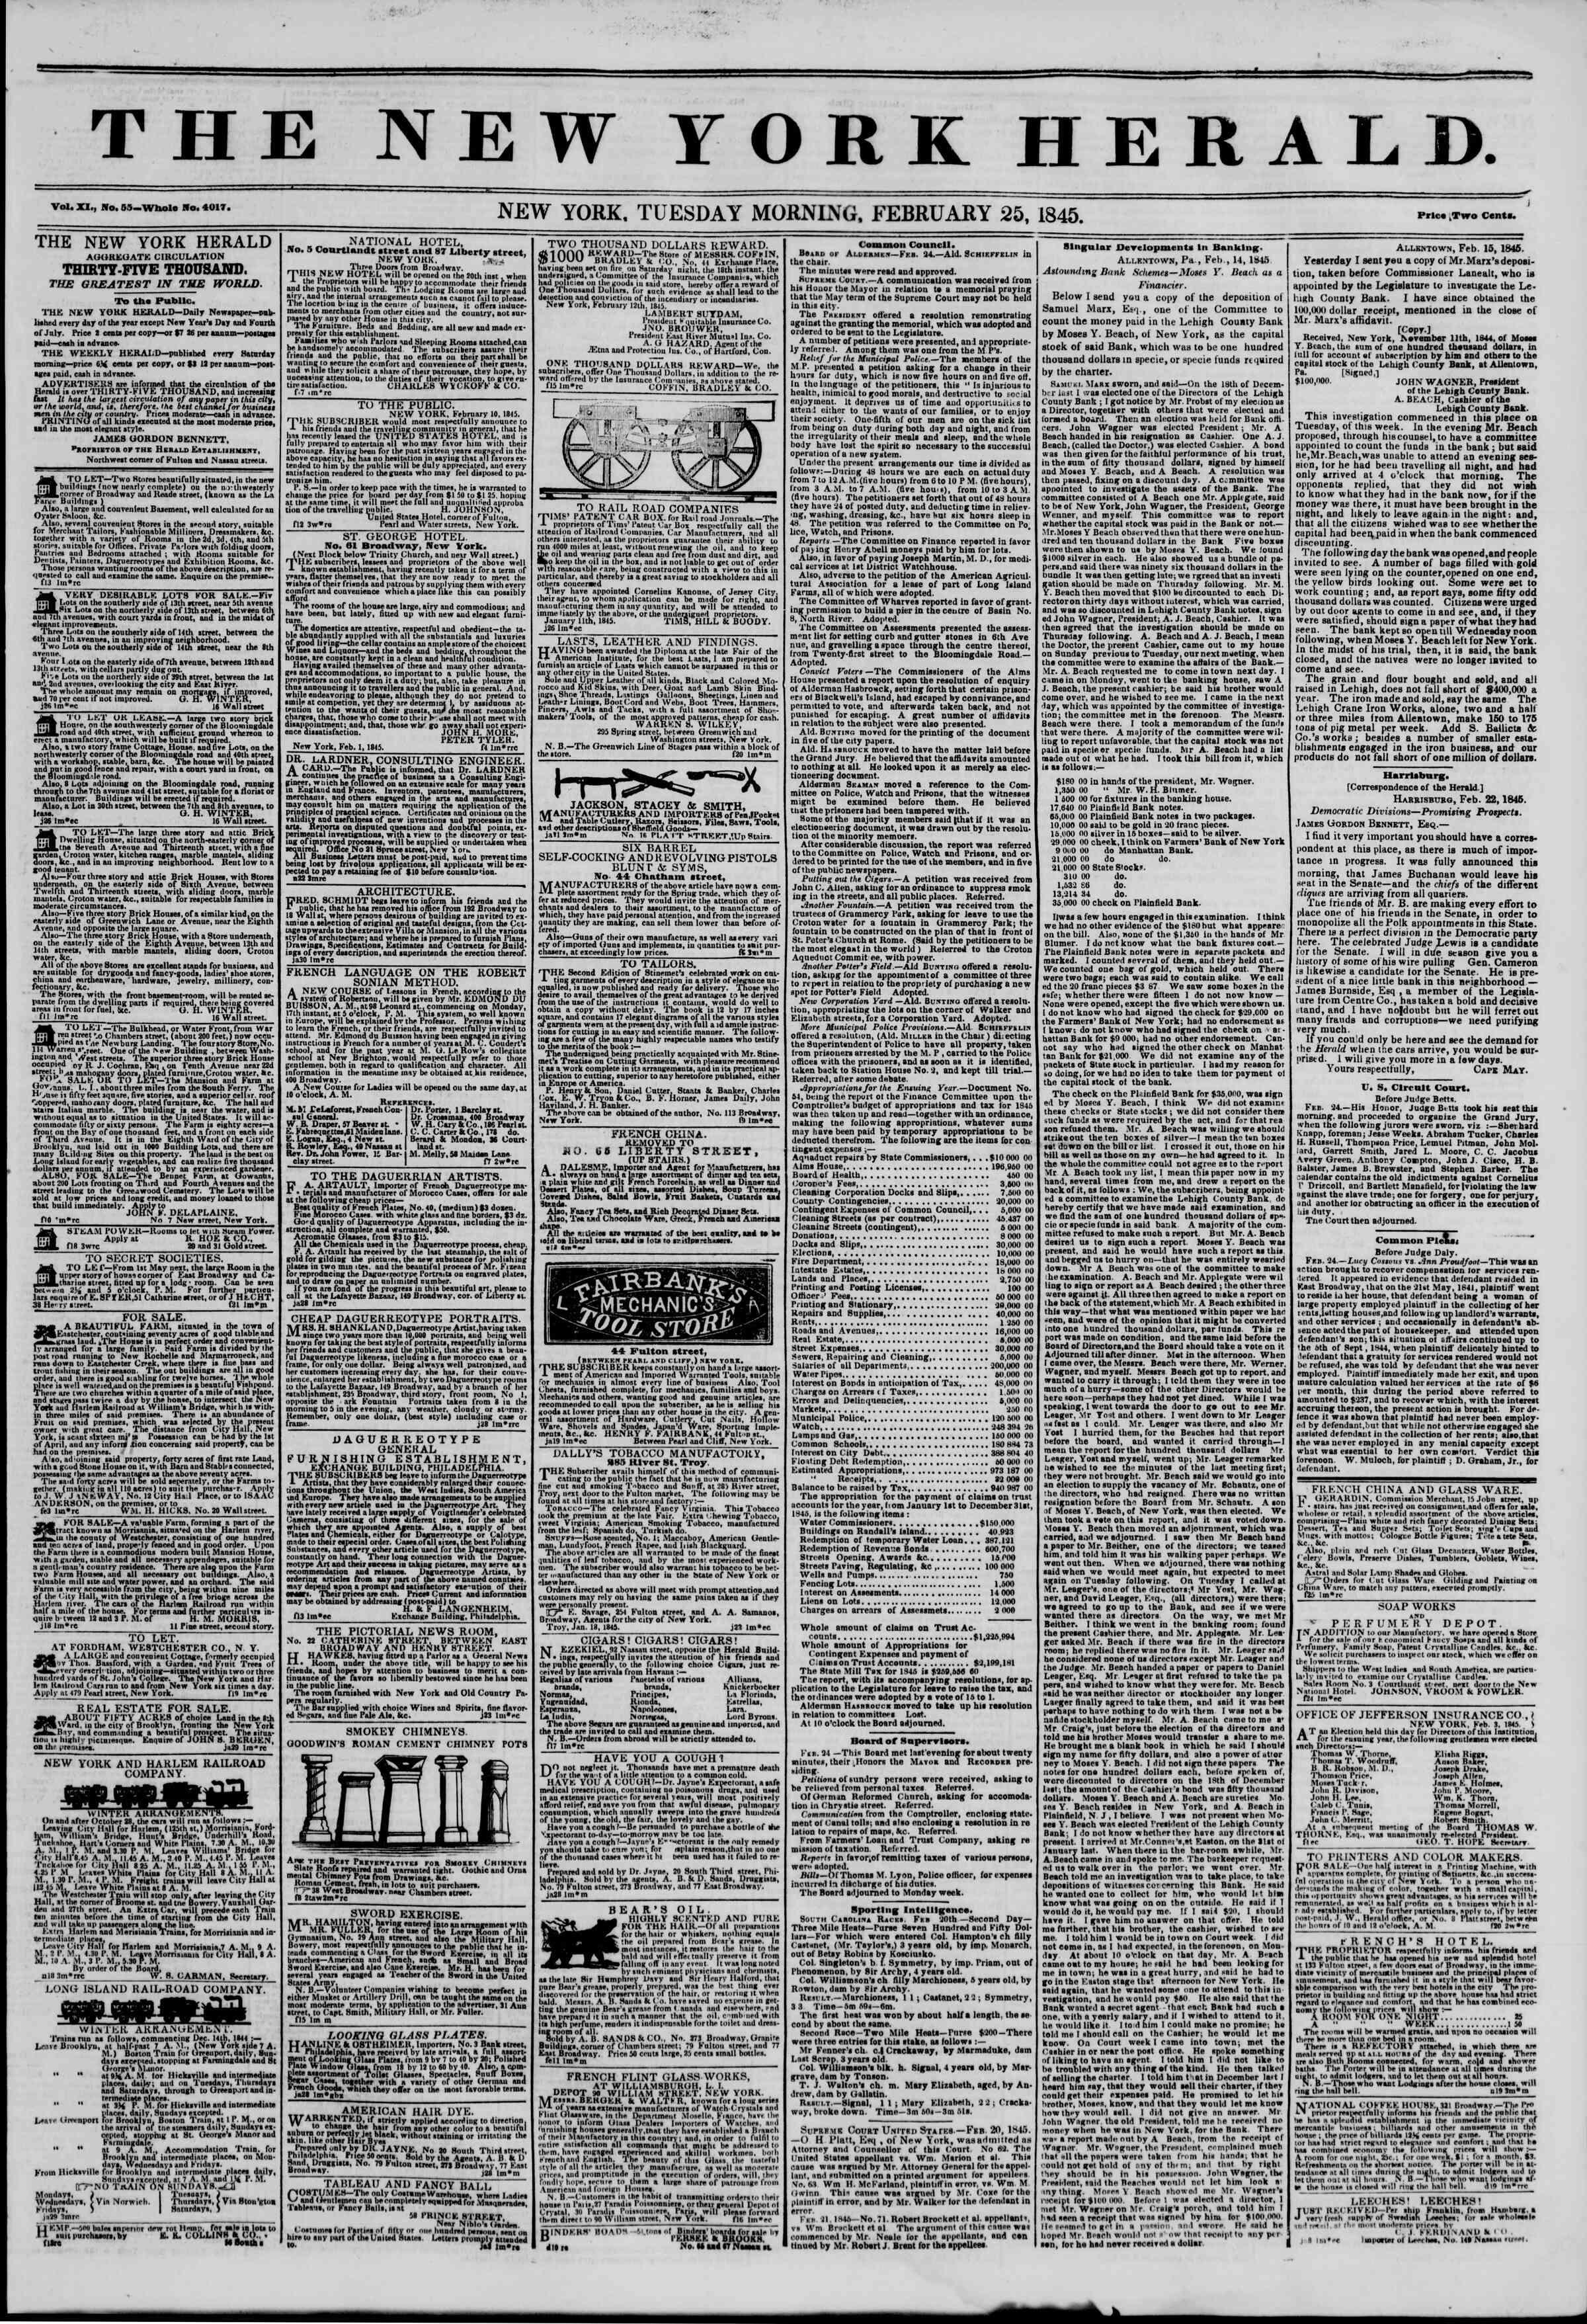 February 25, 1845 Tarihli The New York Herald Gazetesi Sayfa 1